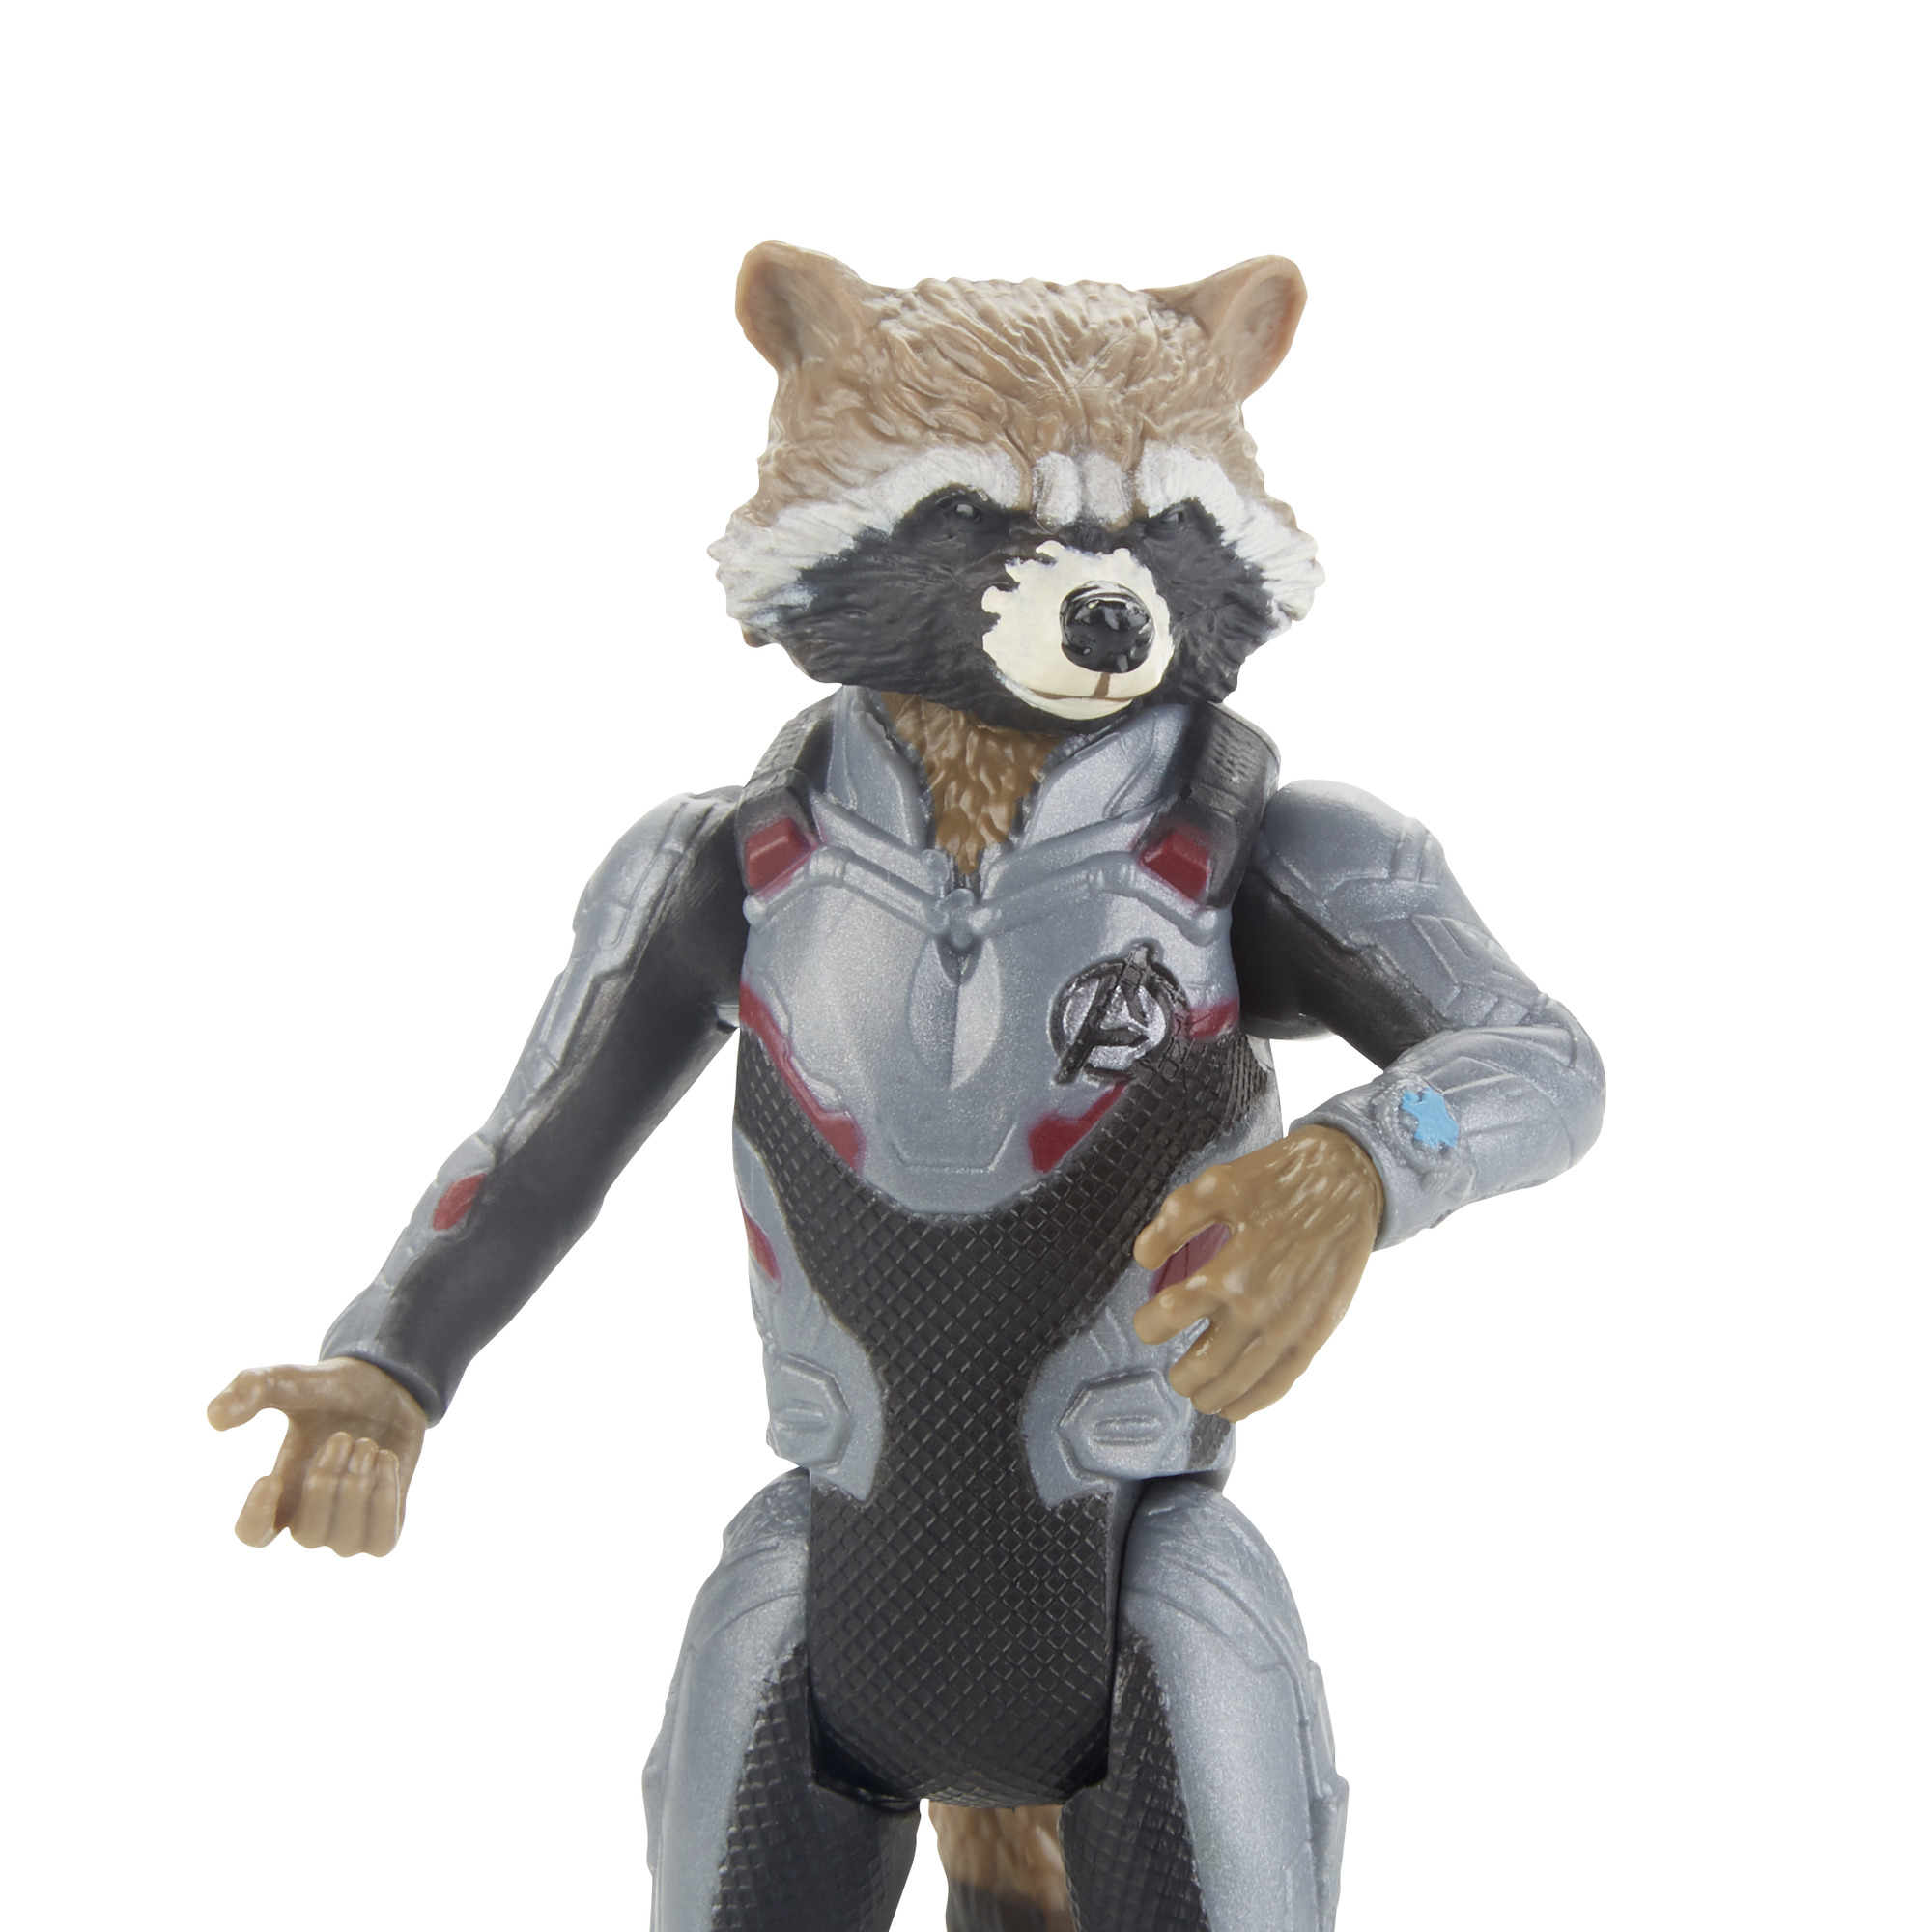 "Marvel Comics The Avengers Endgame Plush Rocket Racoon Movie Soft Doll 9/"" New"